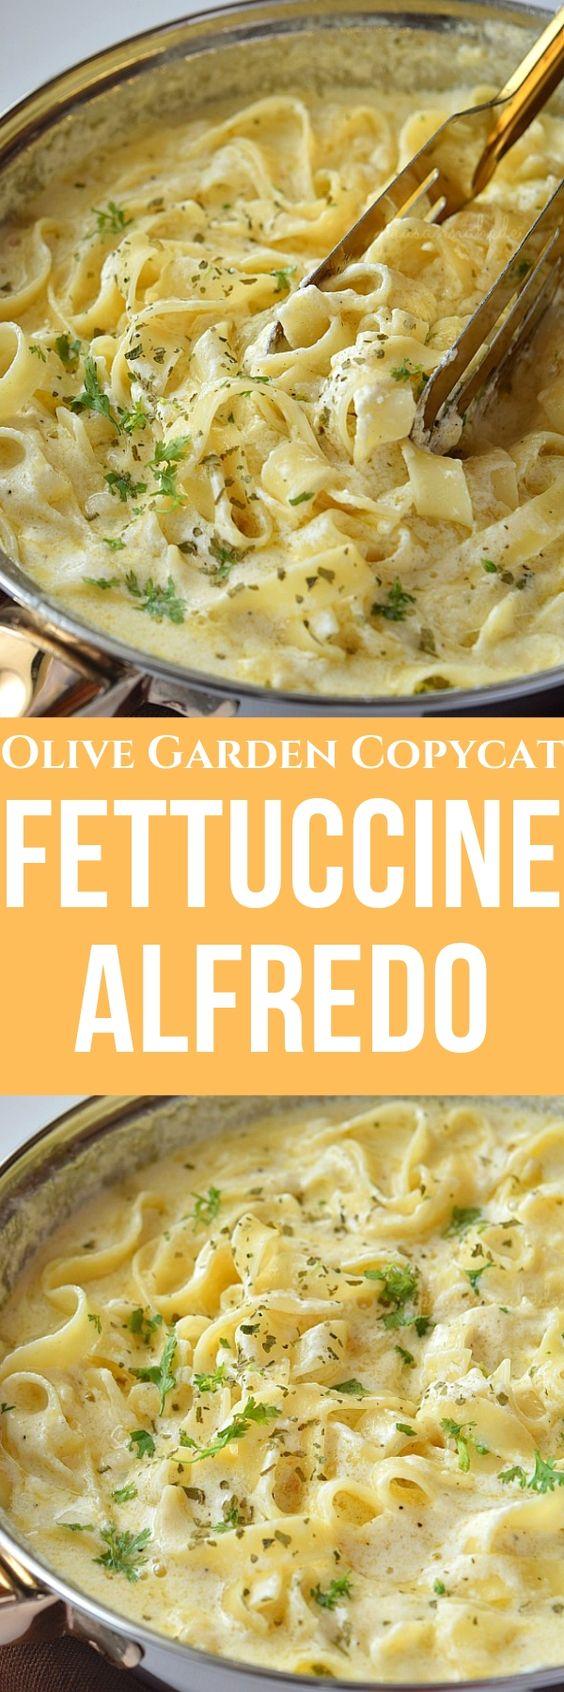 Fettuccine Alfredo (Olive Garden Copycat)